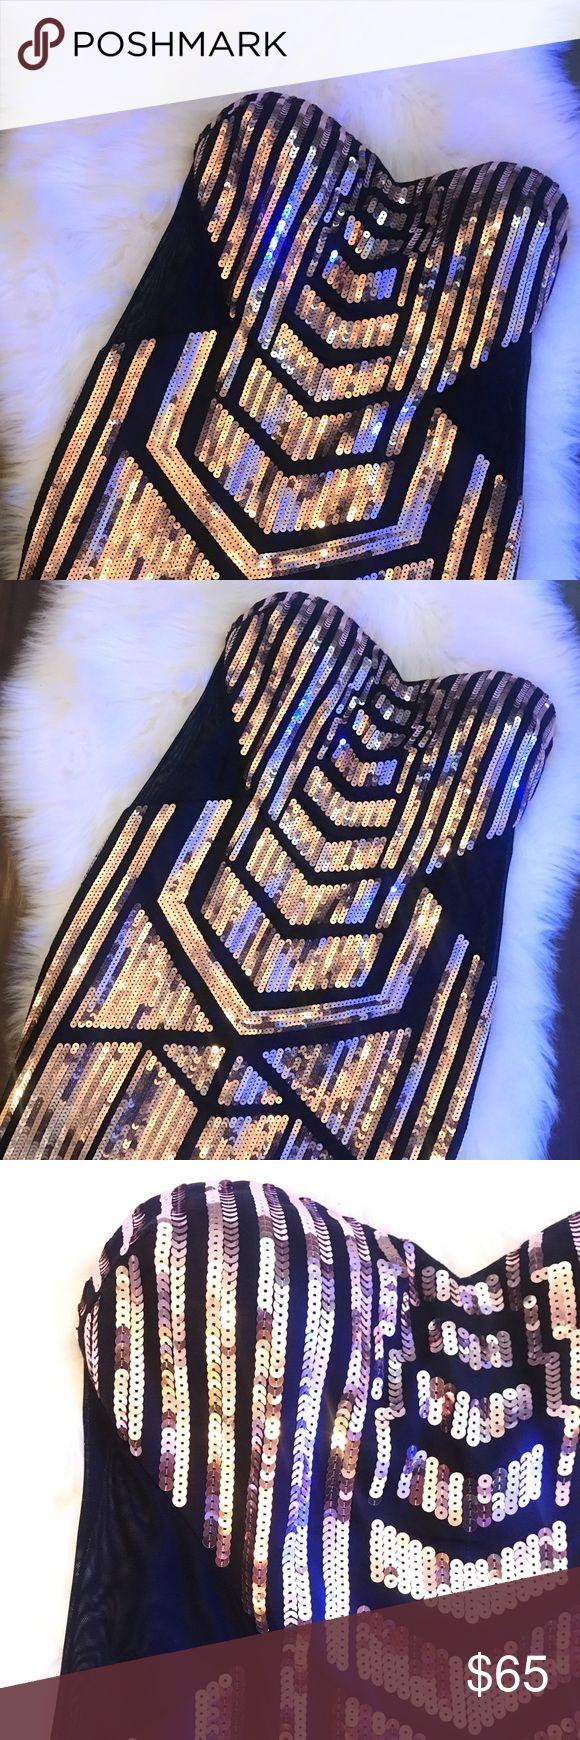 Bebe Tessa Mesh Inset Sequence Dress Bebe Tessa Mesh Inset Sequence Dress in Large. 94% Polyester, 6% Spandex. Mesh paneling on sides of Dress. bebe Dresses